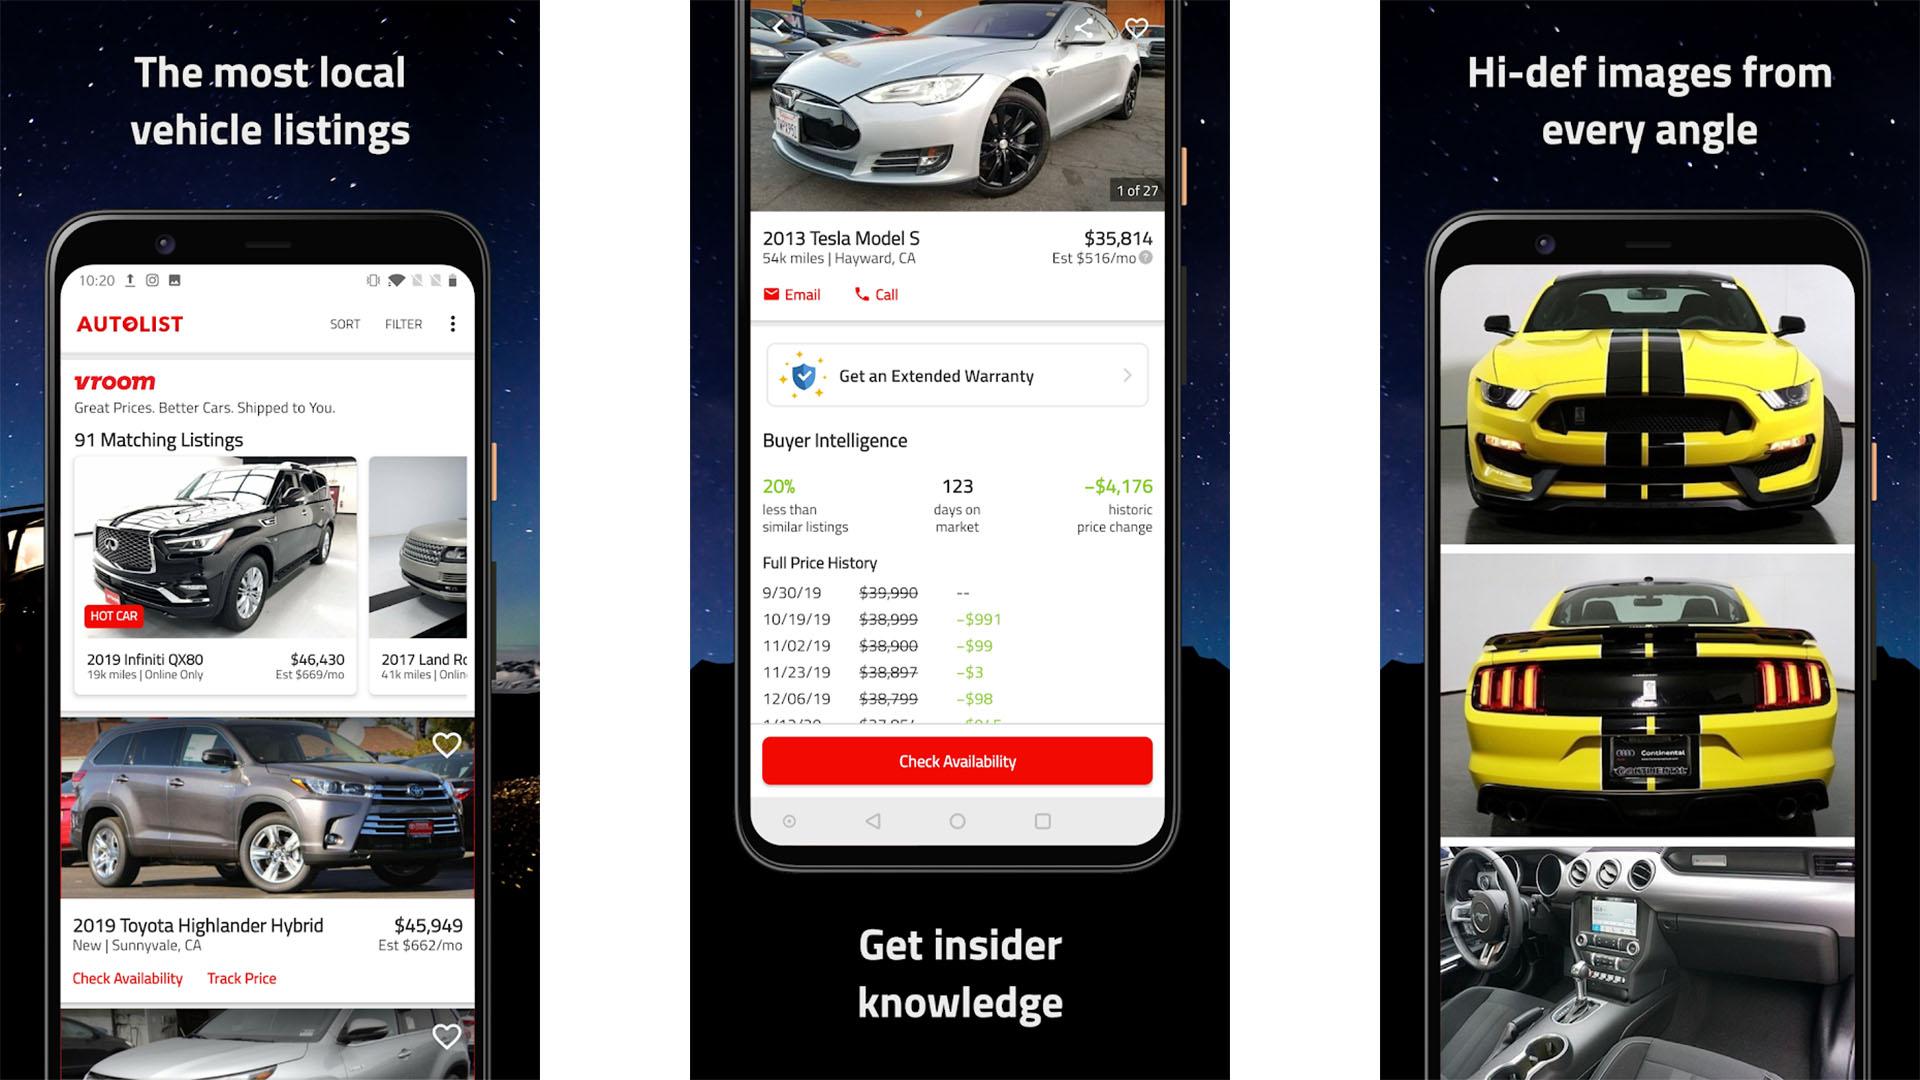 Autolist screenshot 2020